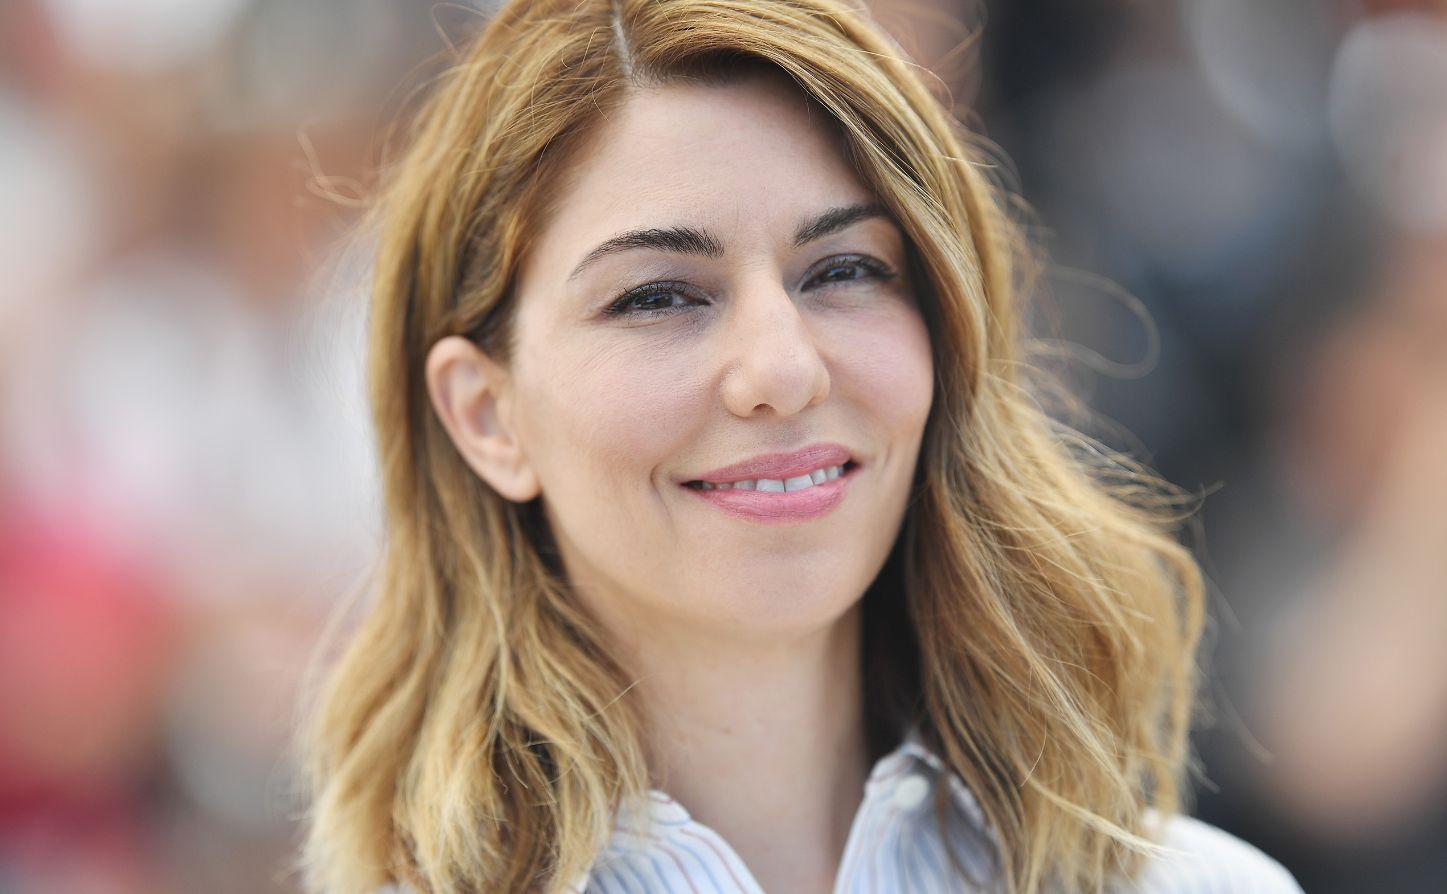 L'inganno: la regista Sofia Coppola a Cannes